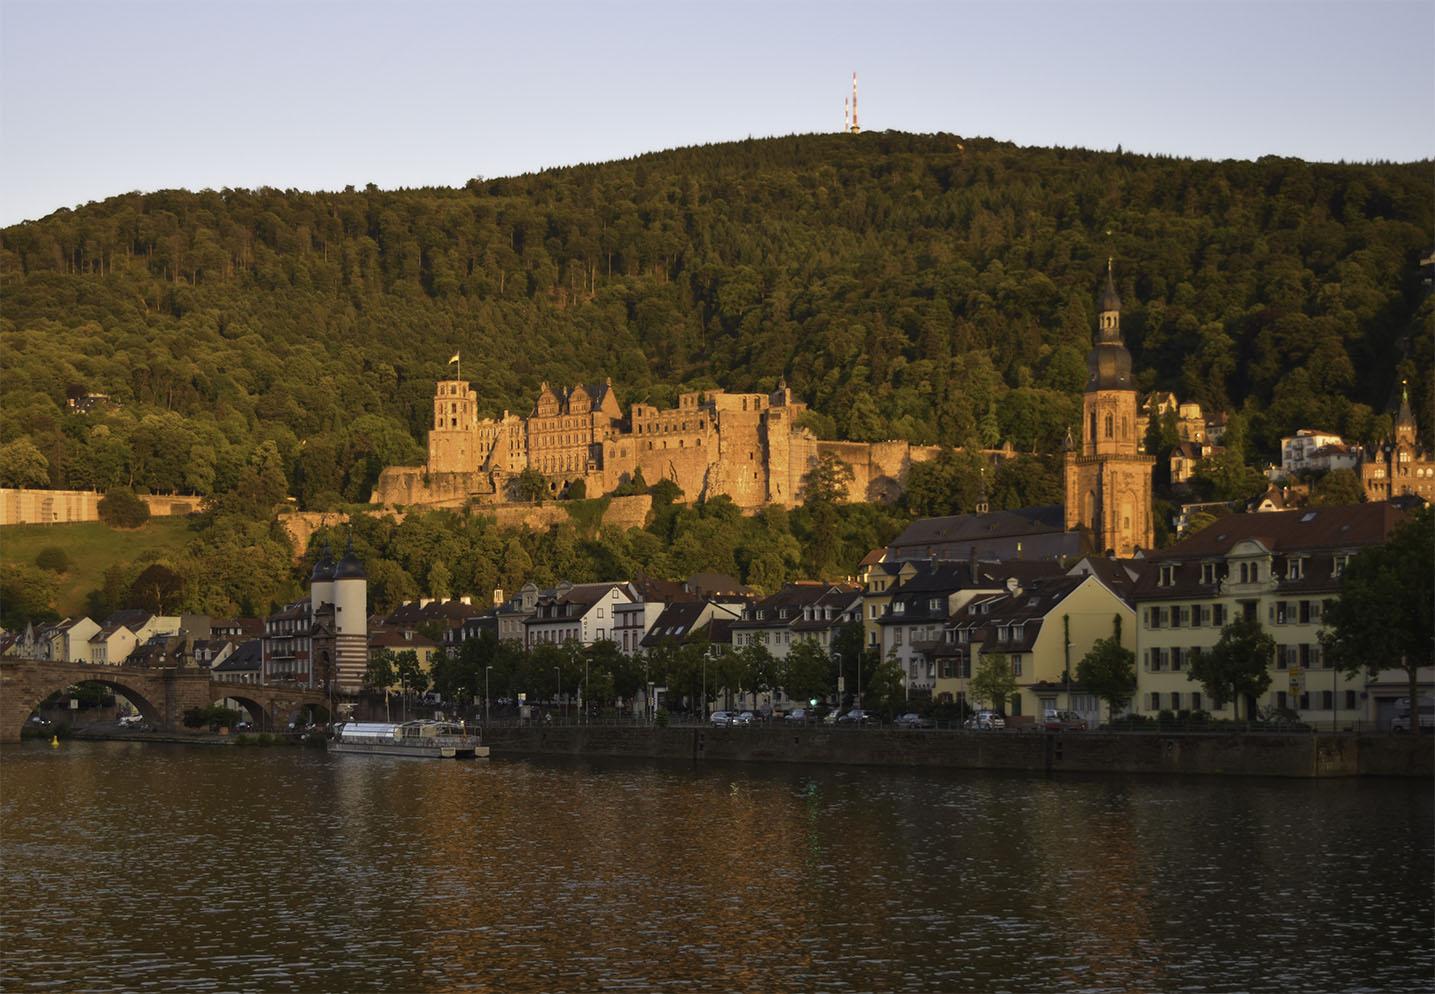 Heidelberg Bridge, Castle and Church Photograph by David Hill taken 25 August 2015, 17 58 GMT